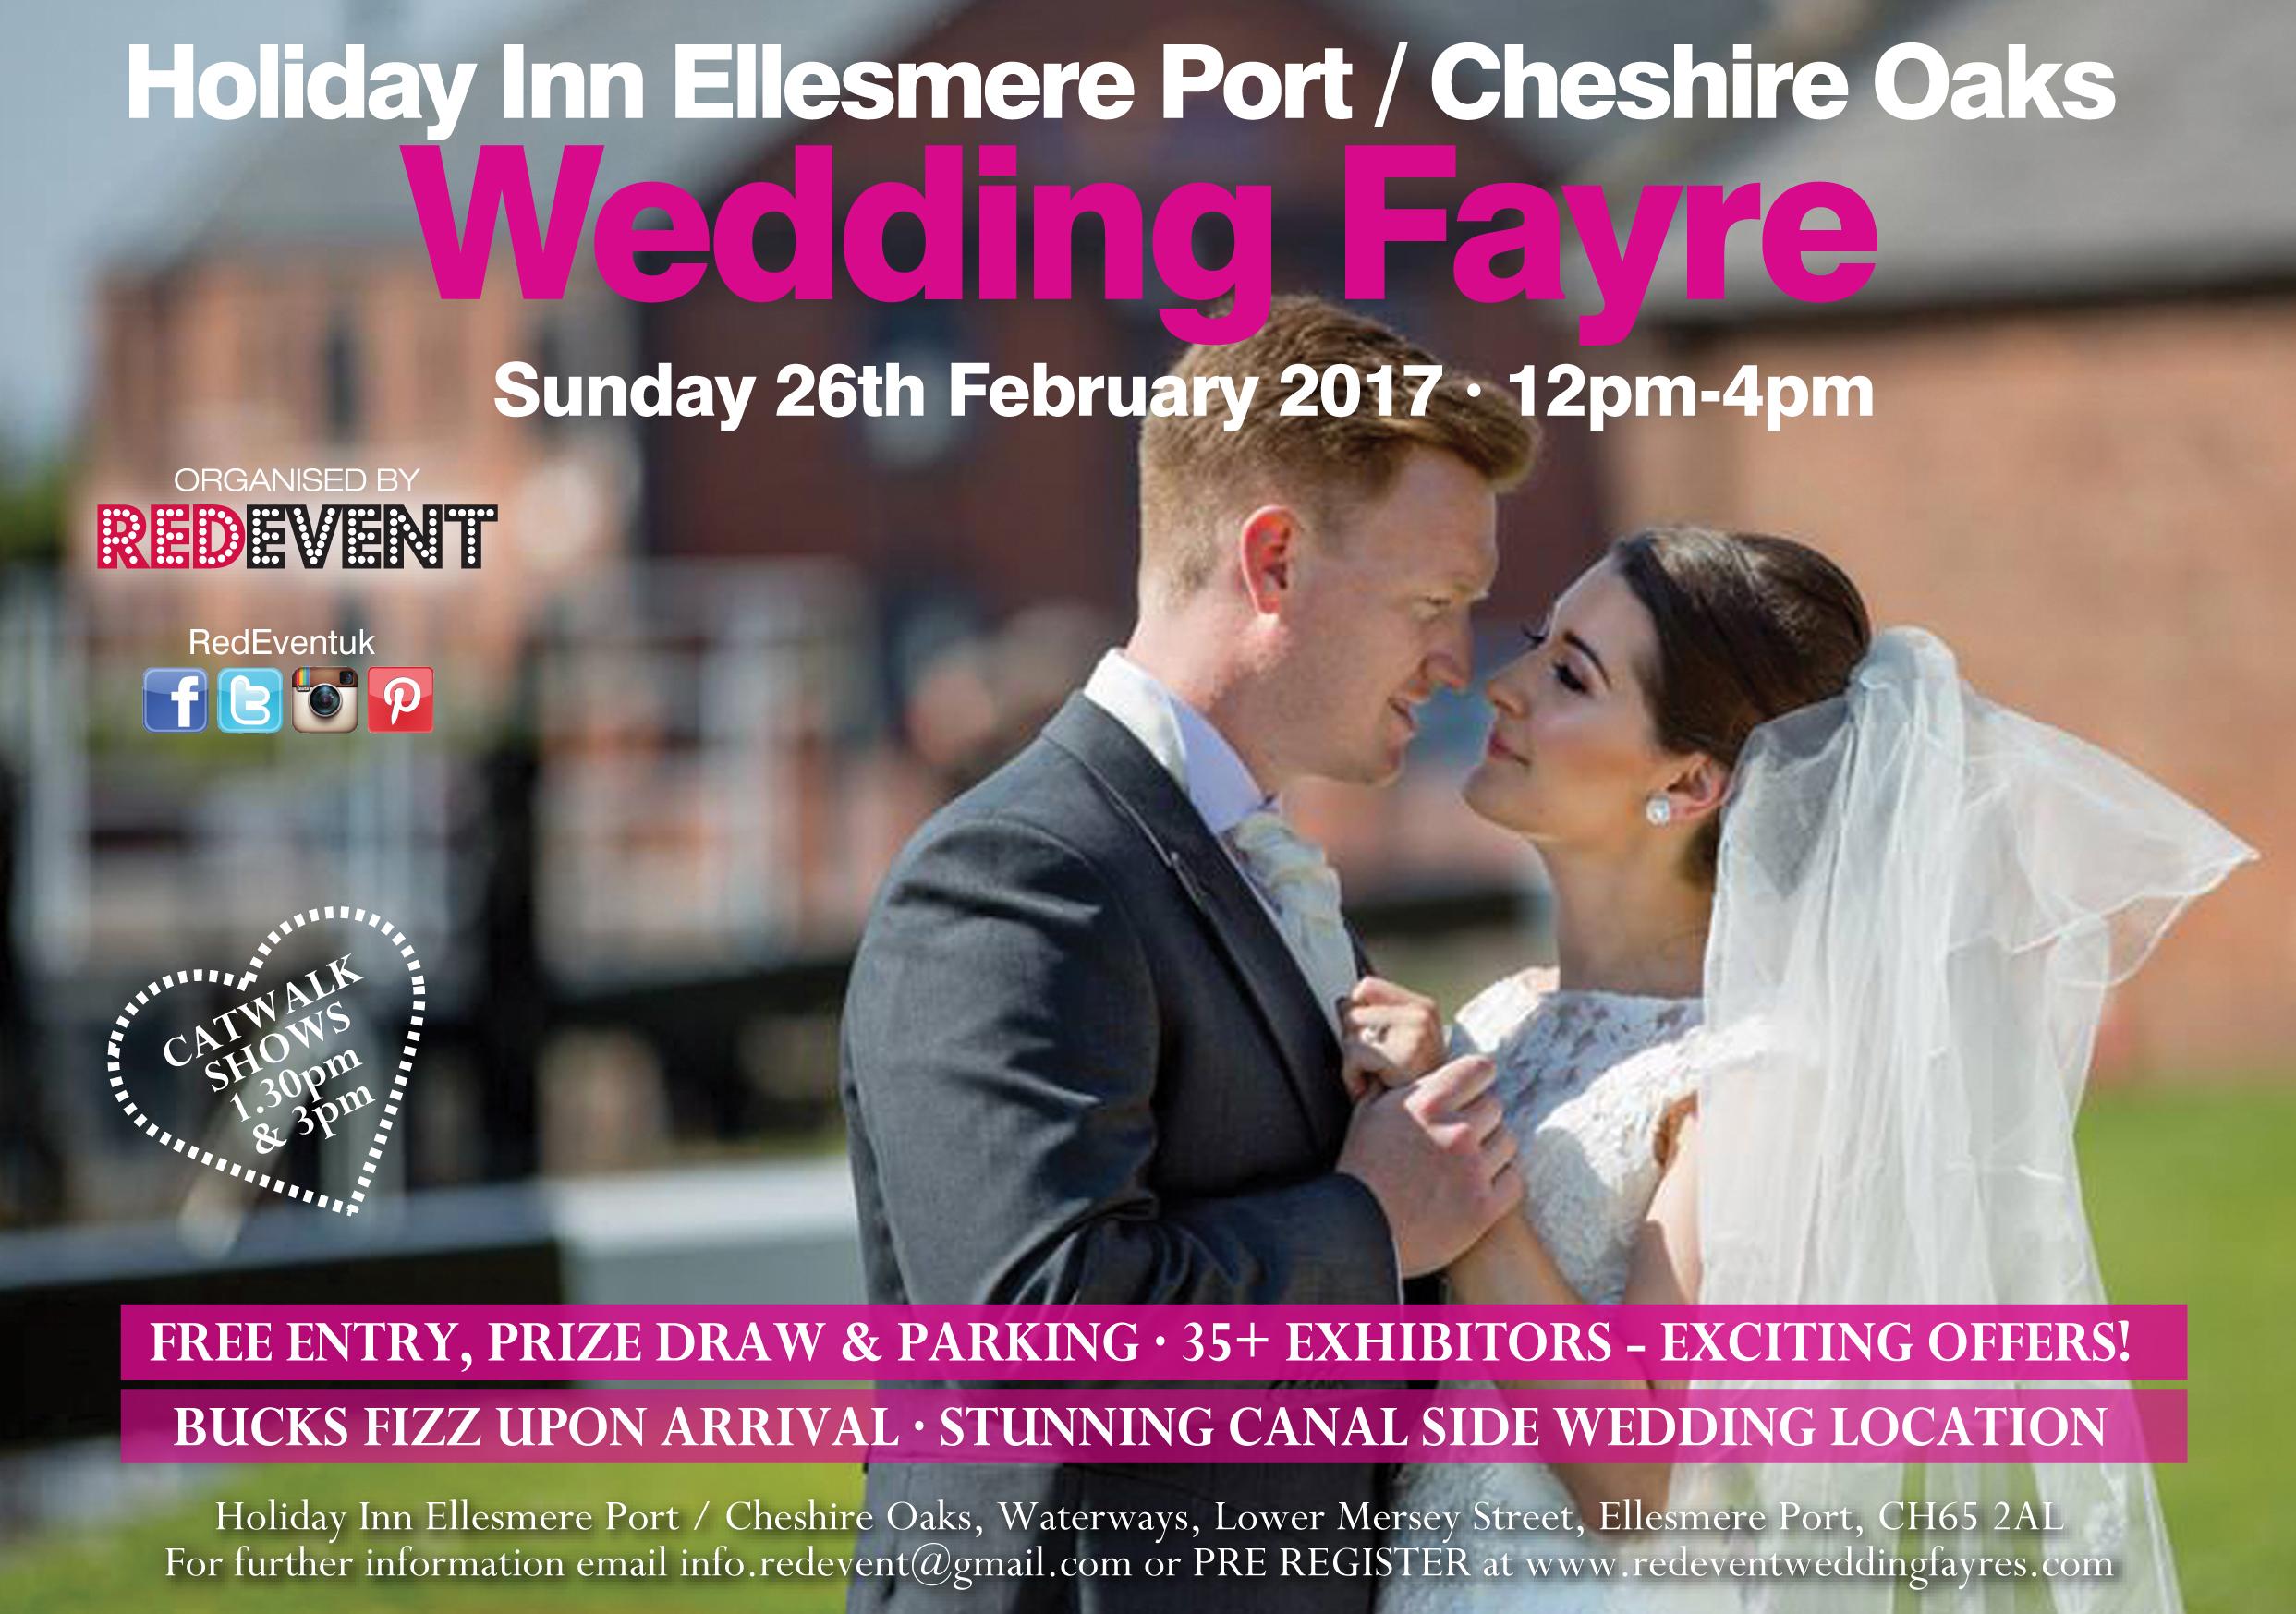 Holiday Inn Ellesmere Port Cheshire Oaks Wedding Fayre Flyer Red Event www.redeventweddingfayres.com